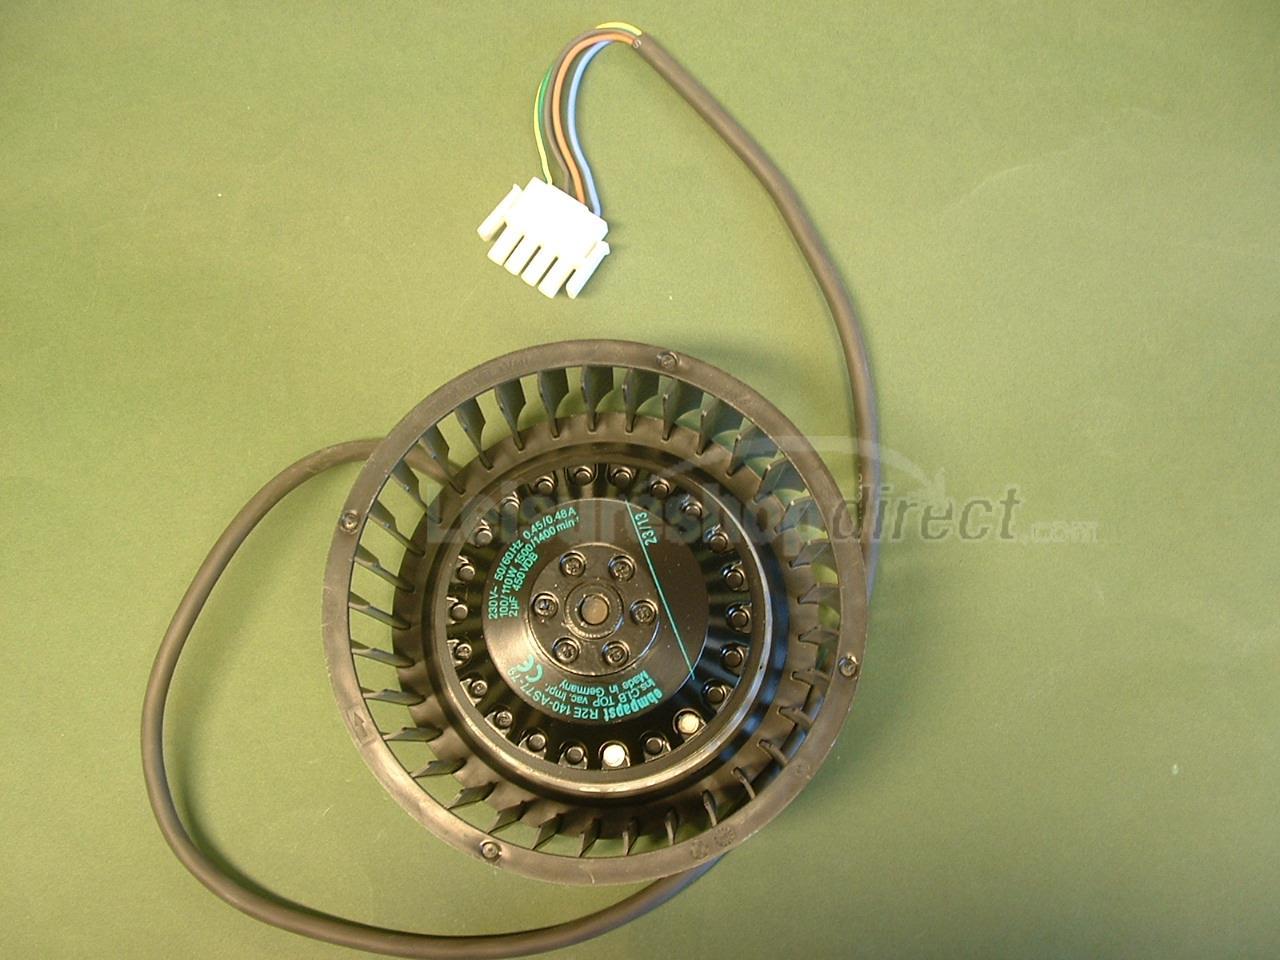 Ventilator Rear Evaporator For Dometic Fj1100 Air Conditioner Wiring Diagram Image 1